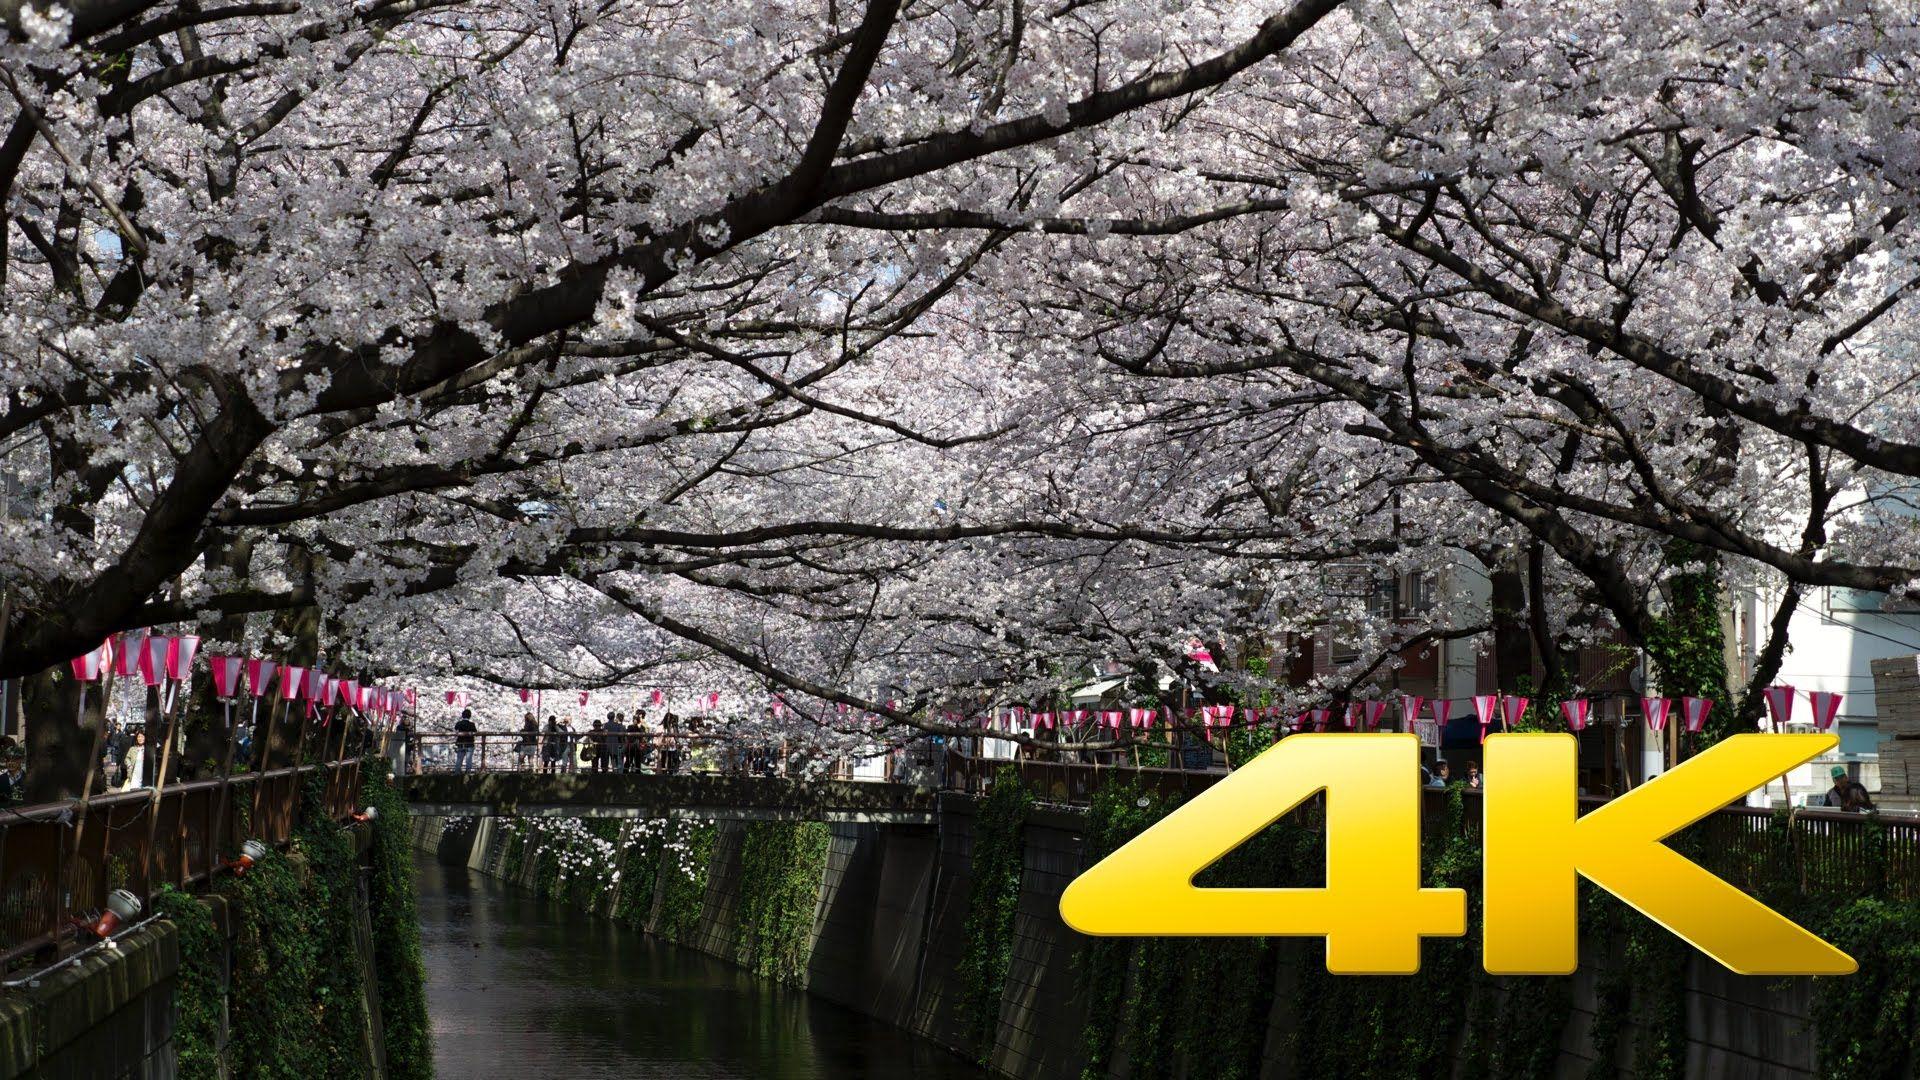 Tokyo Nakameguro Cherry Blossom - 中目黒のさくら - 4K Ultra HD www